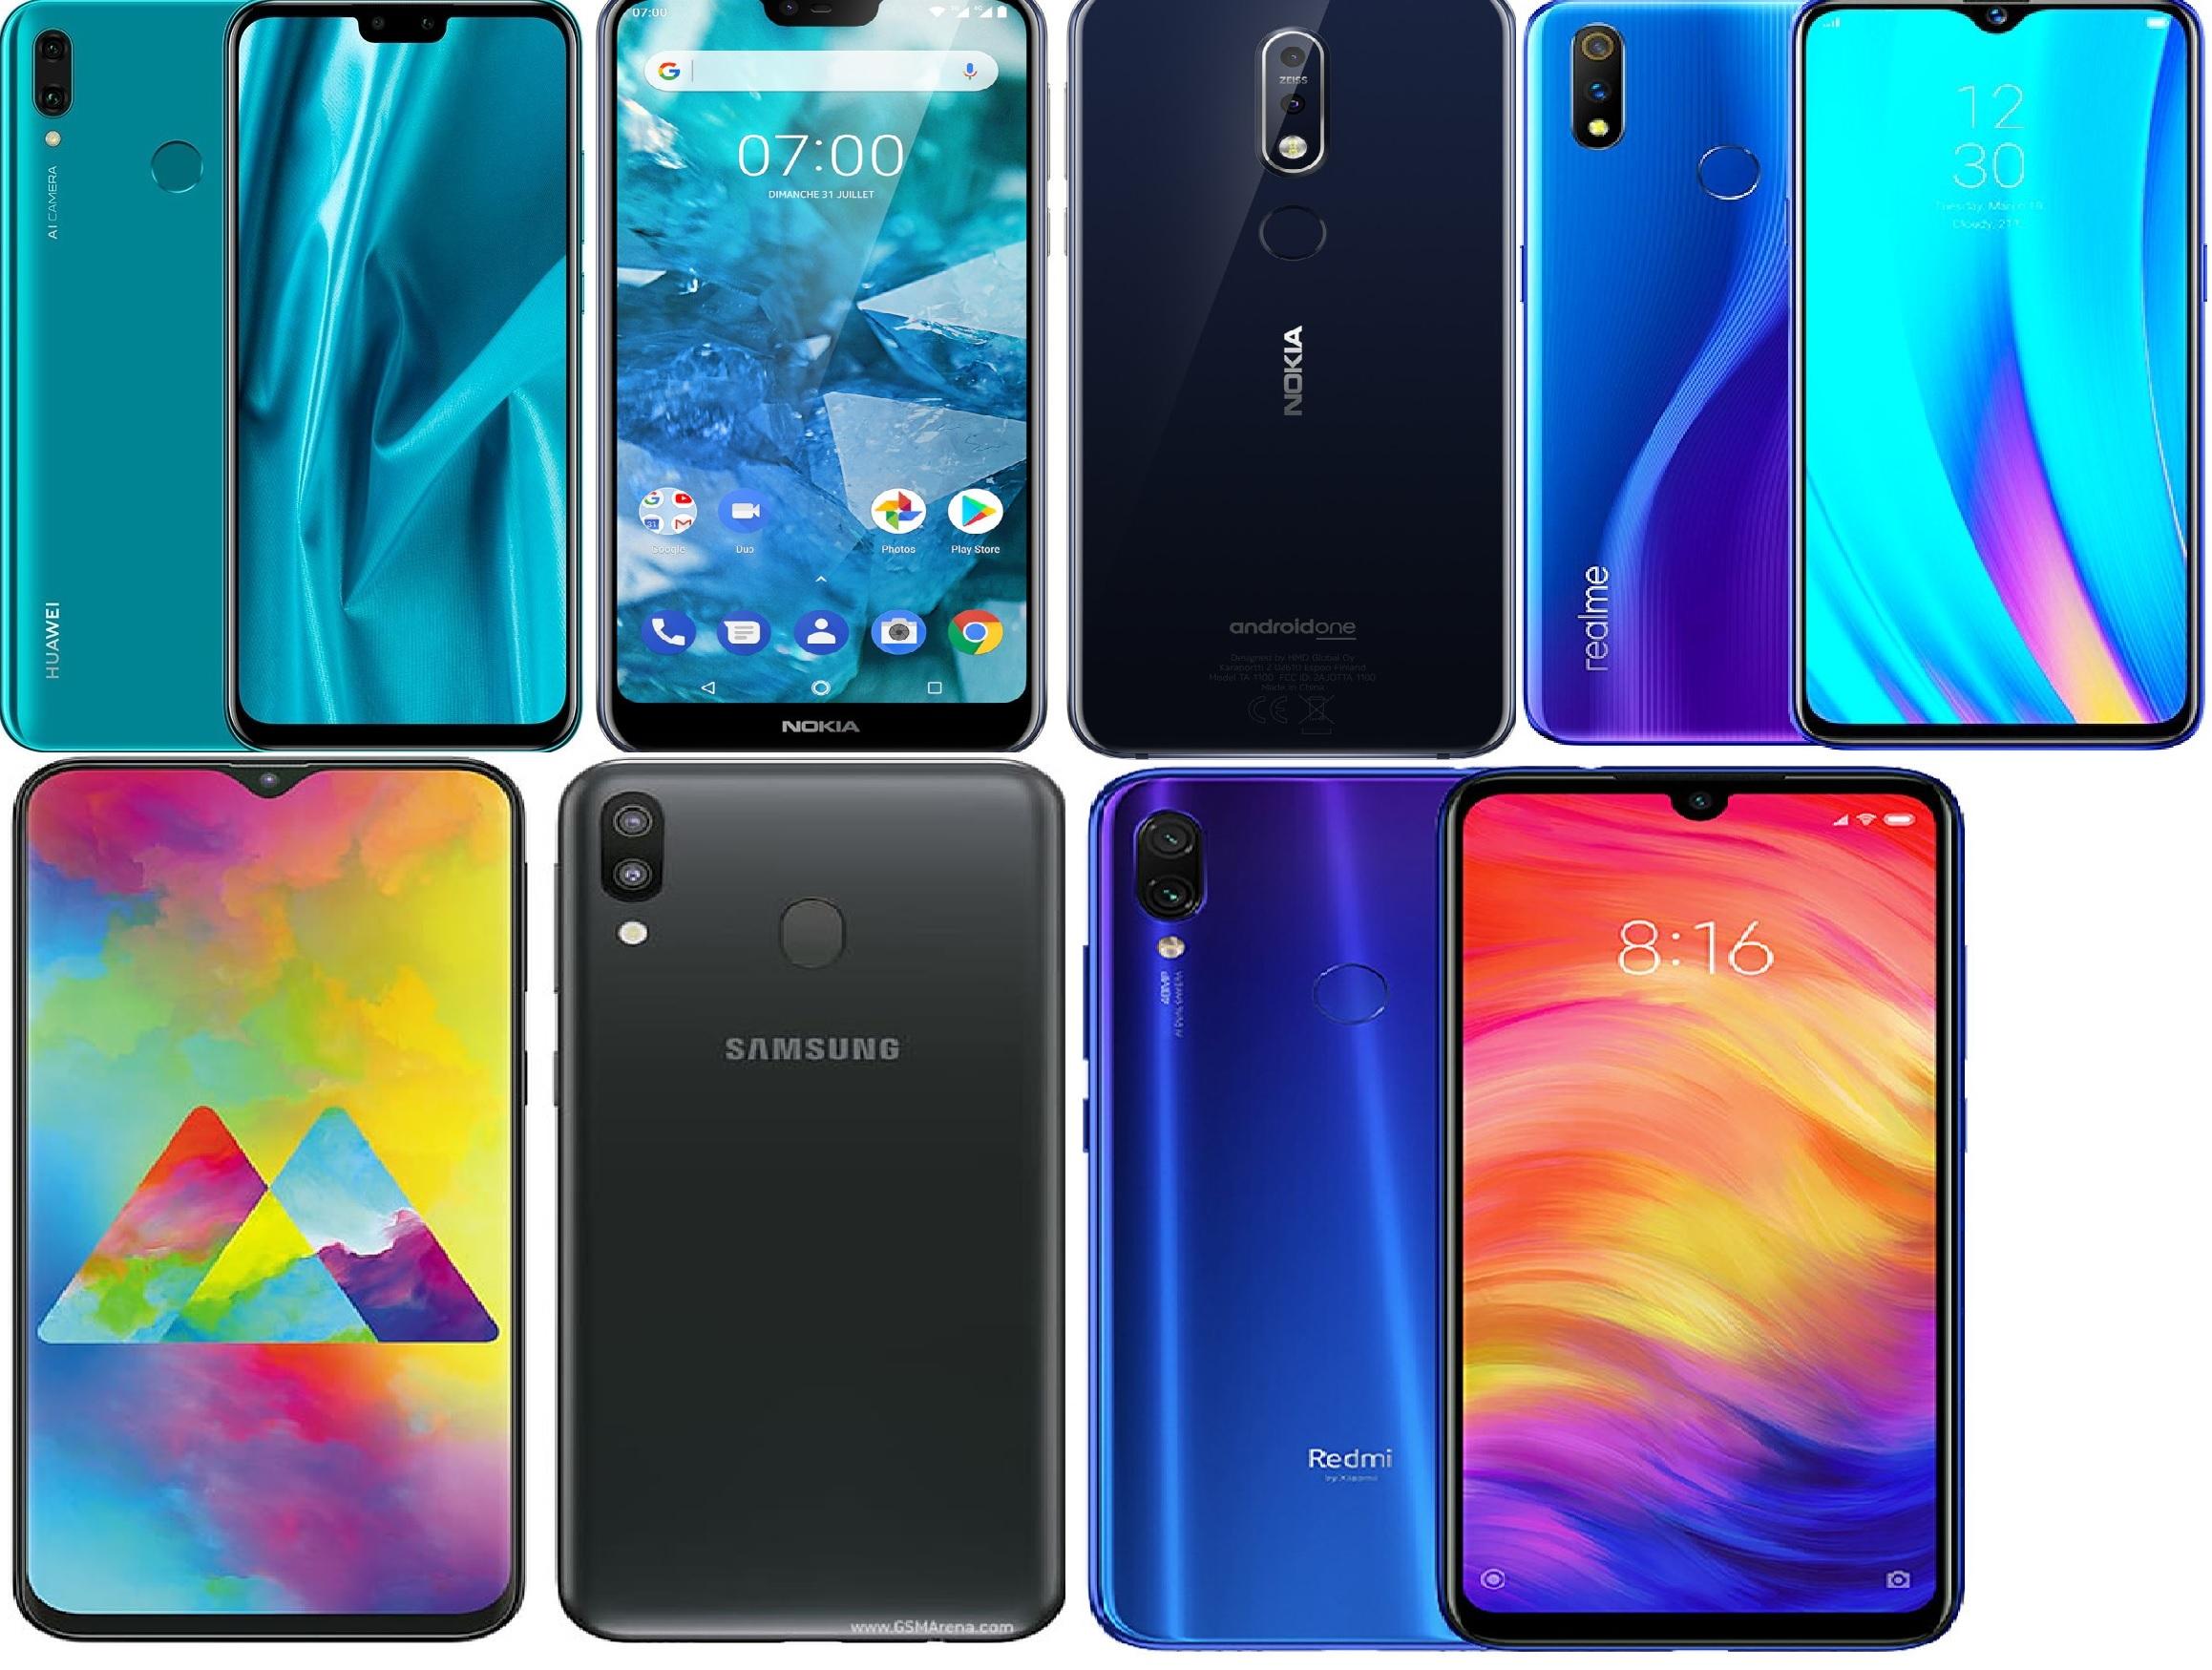 2019 Top 5 Phones You Can Buy In Range Of Rs. 35,000